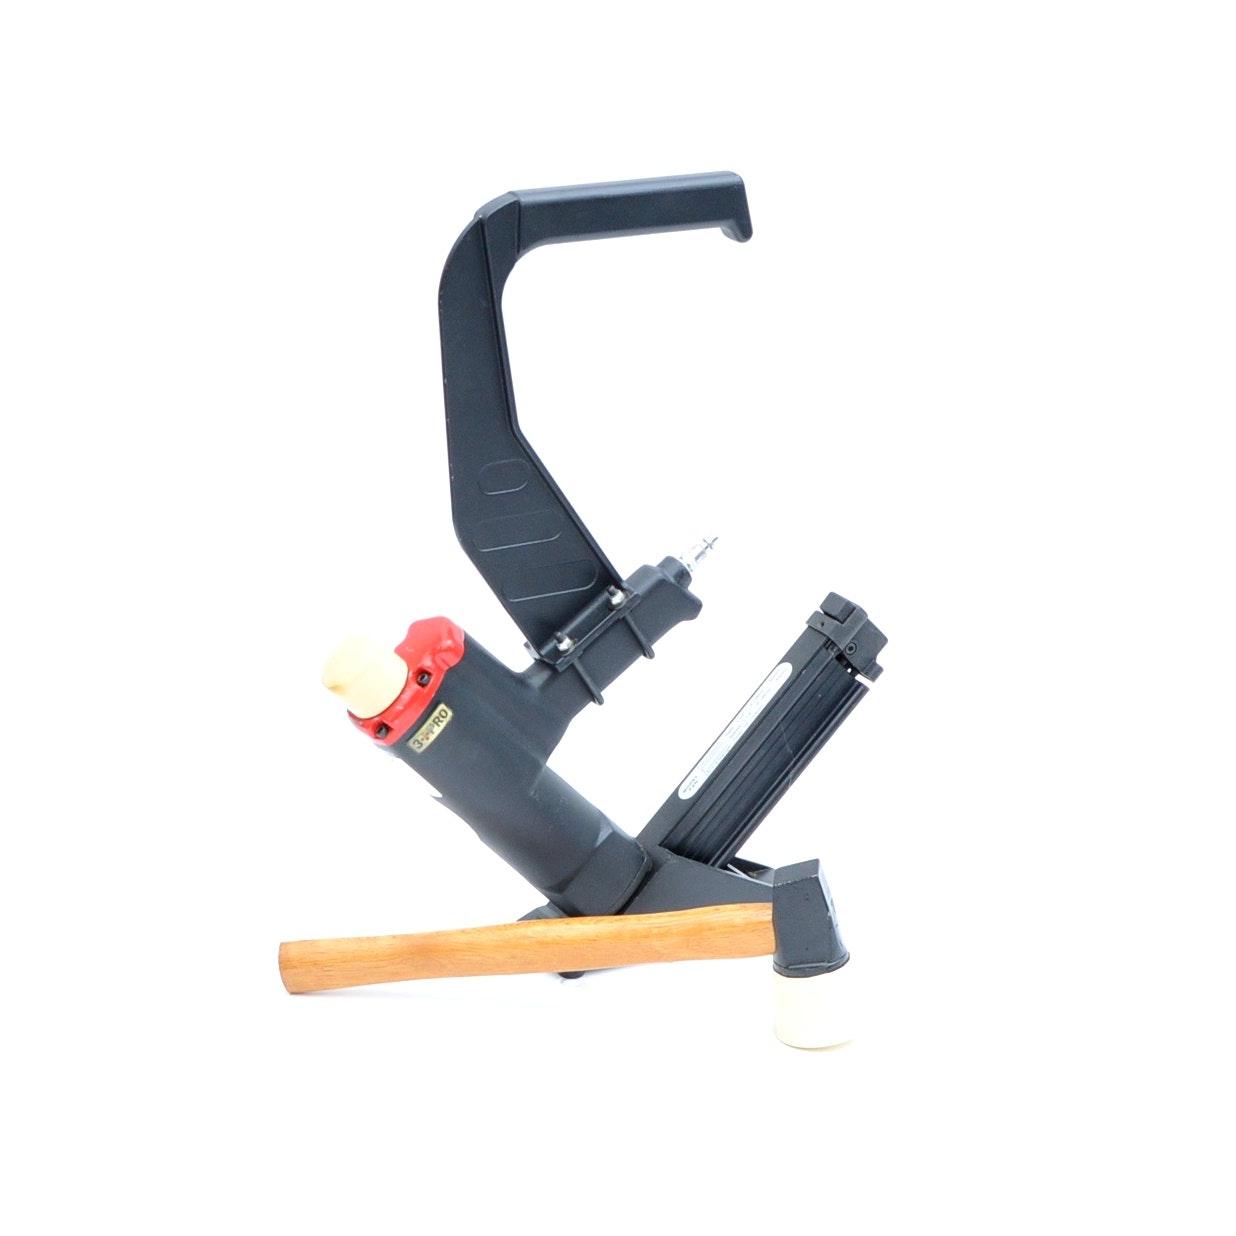 3 PRO 15 1/2 Gauge Combination Flooring Stapler and Cleat Nailer